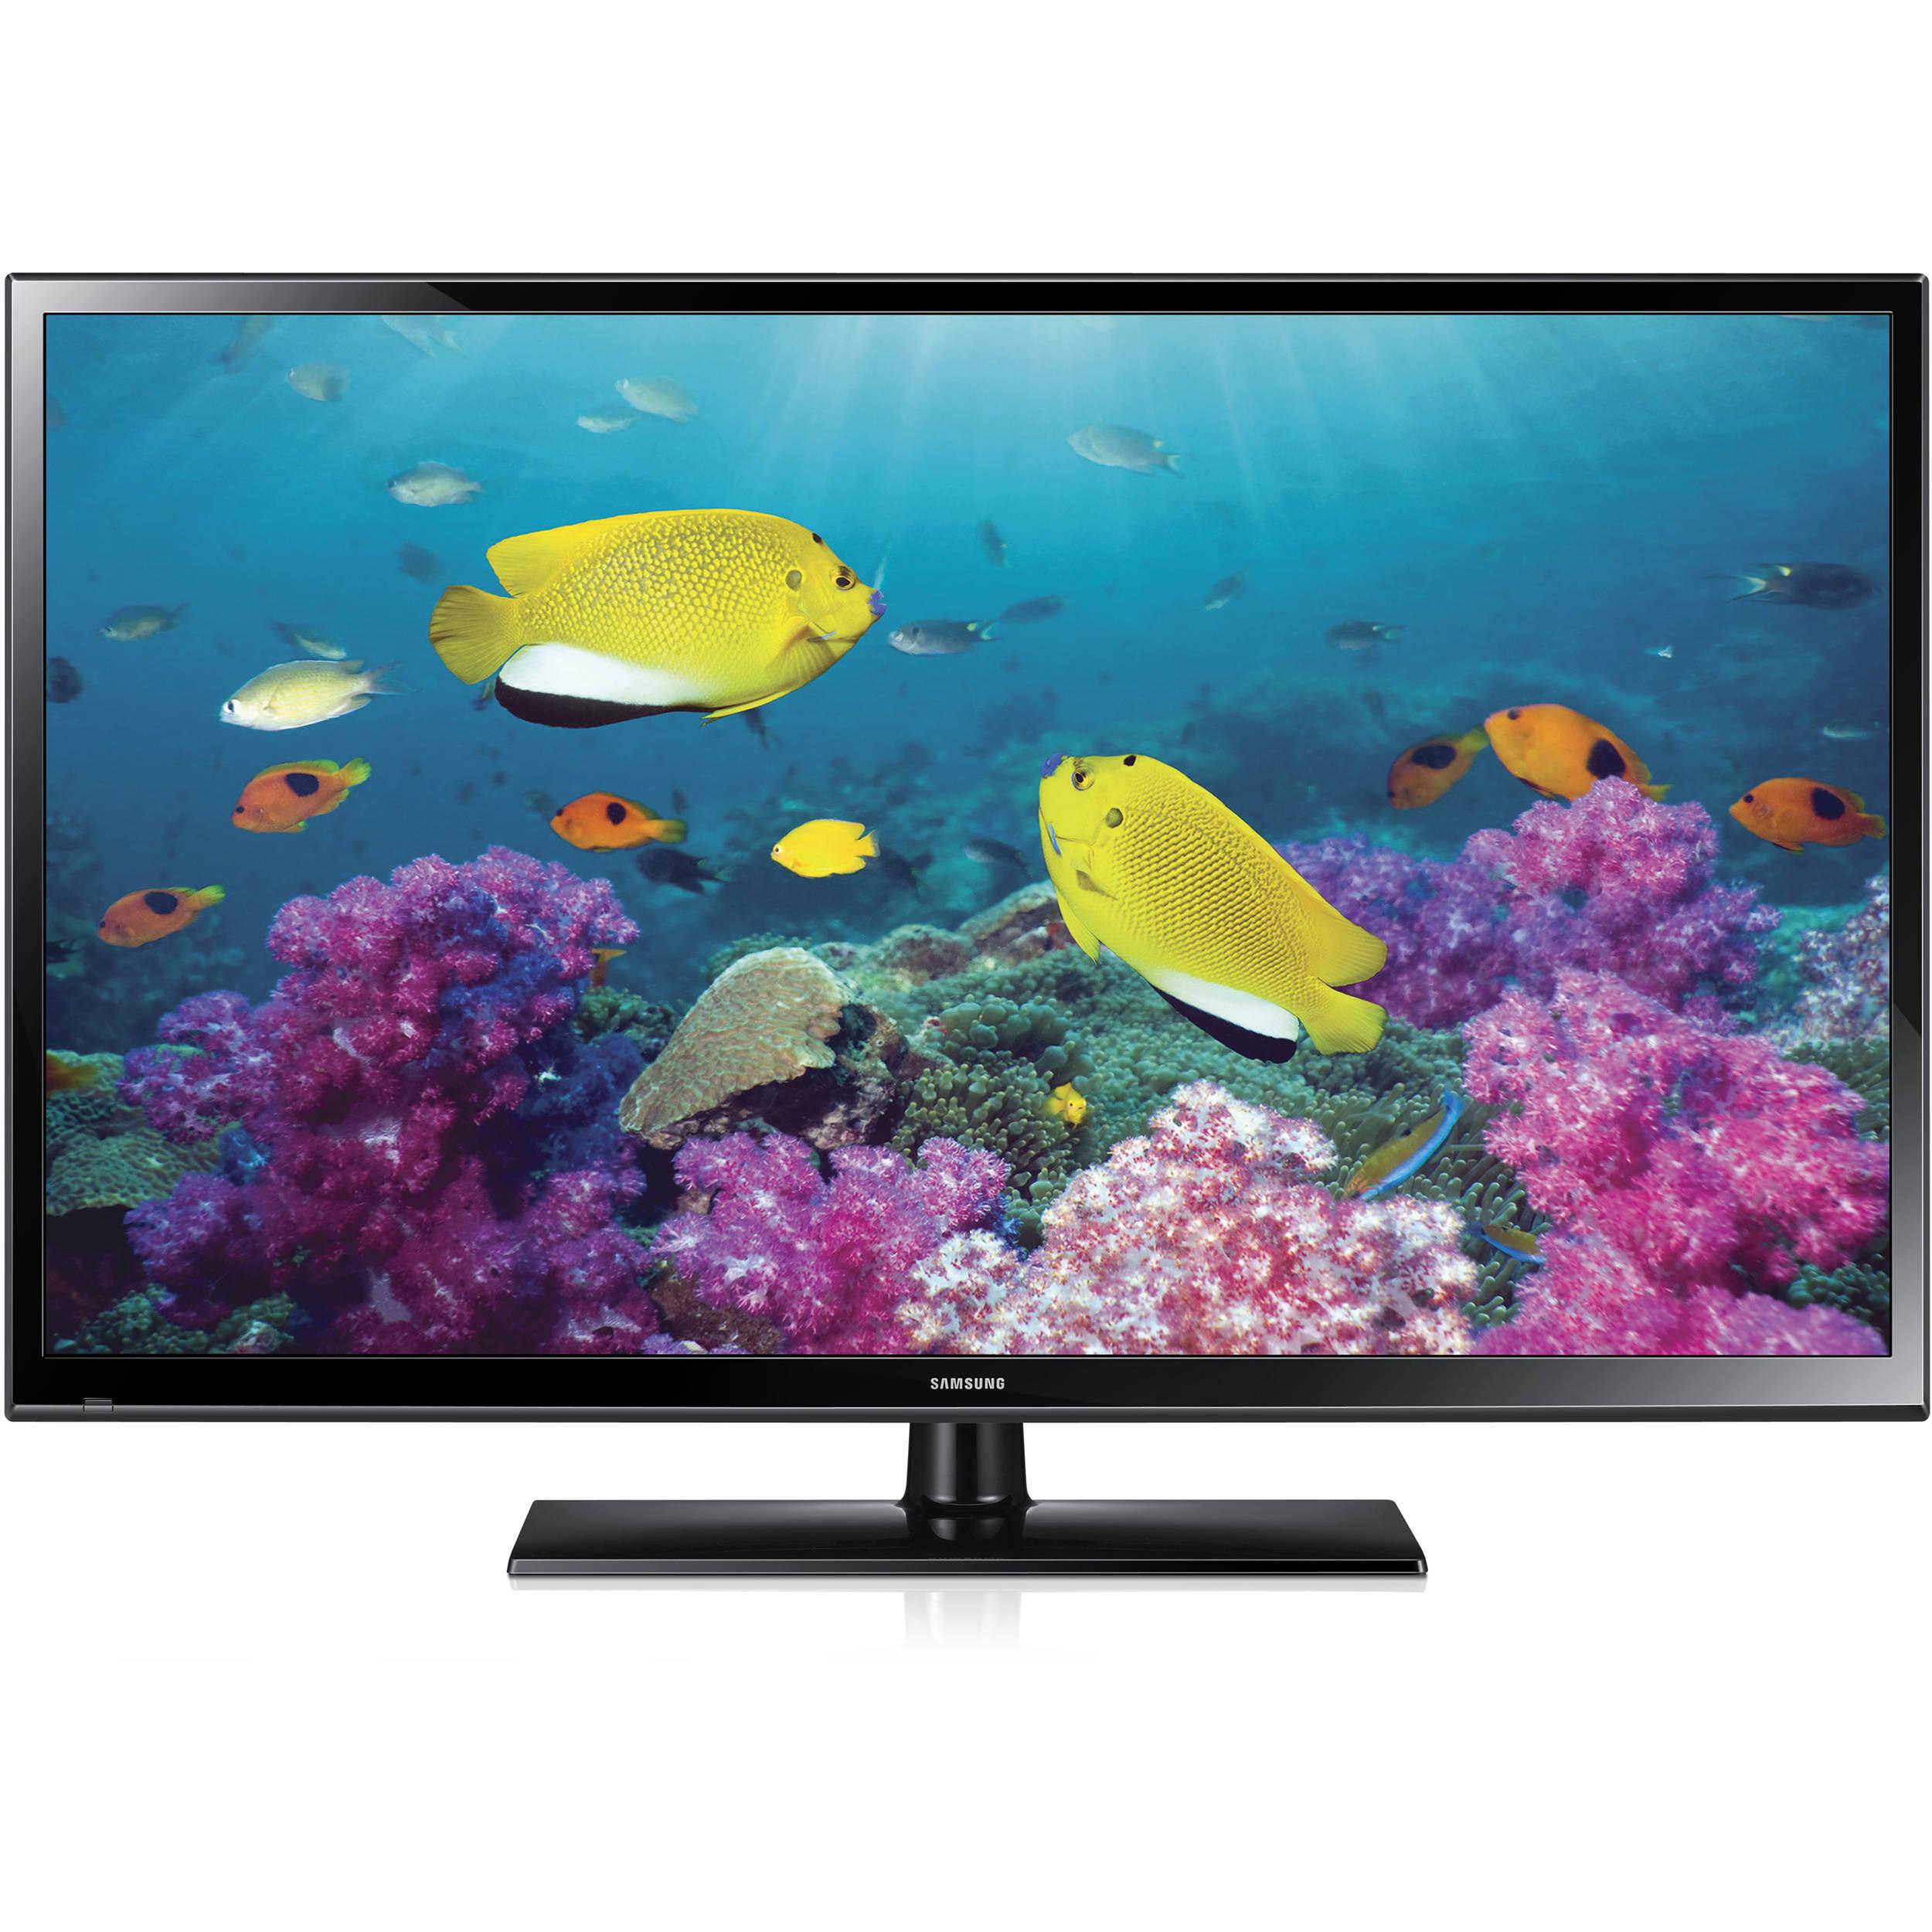 Samsung 51 4500 Plasma Tv Pn51f4500bfxza B H Photo